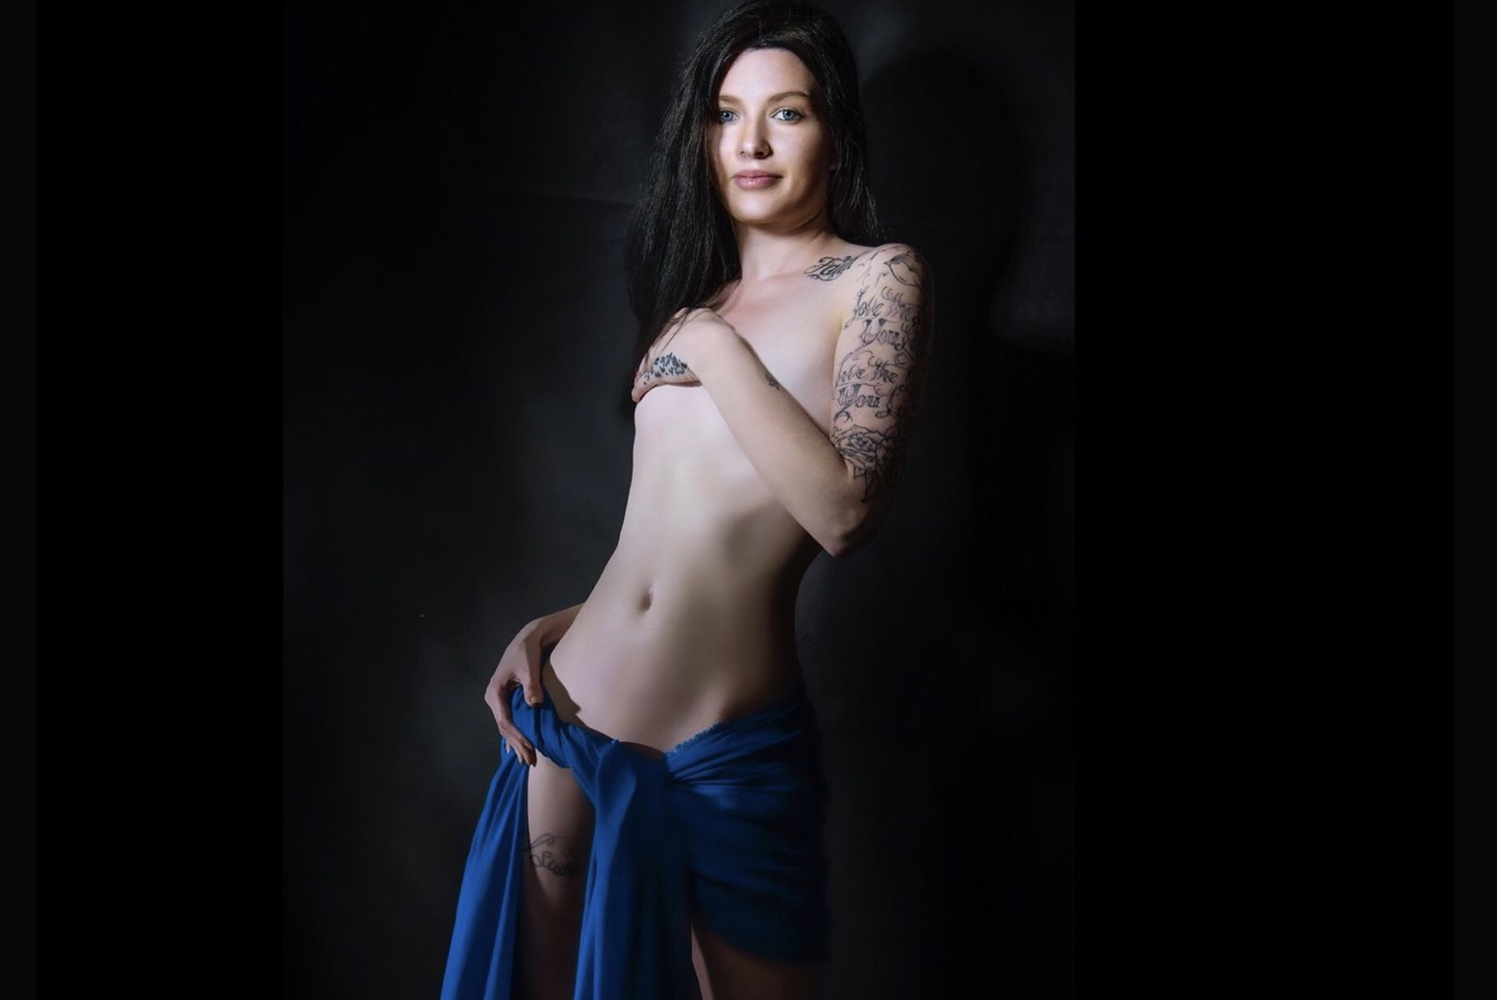 Sarah by Studio 403